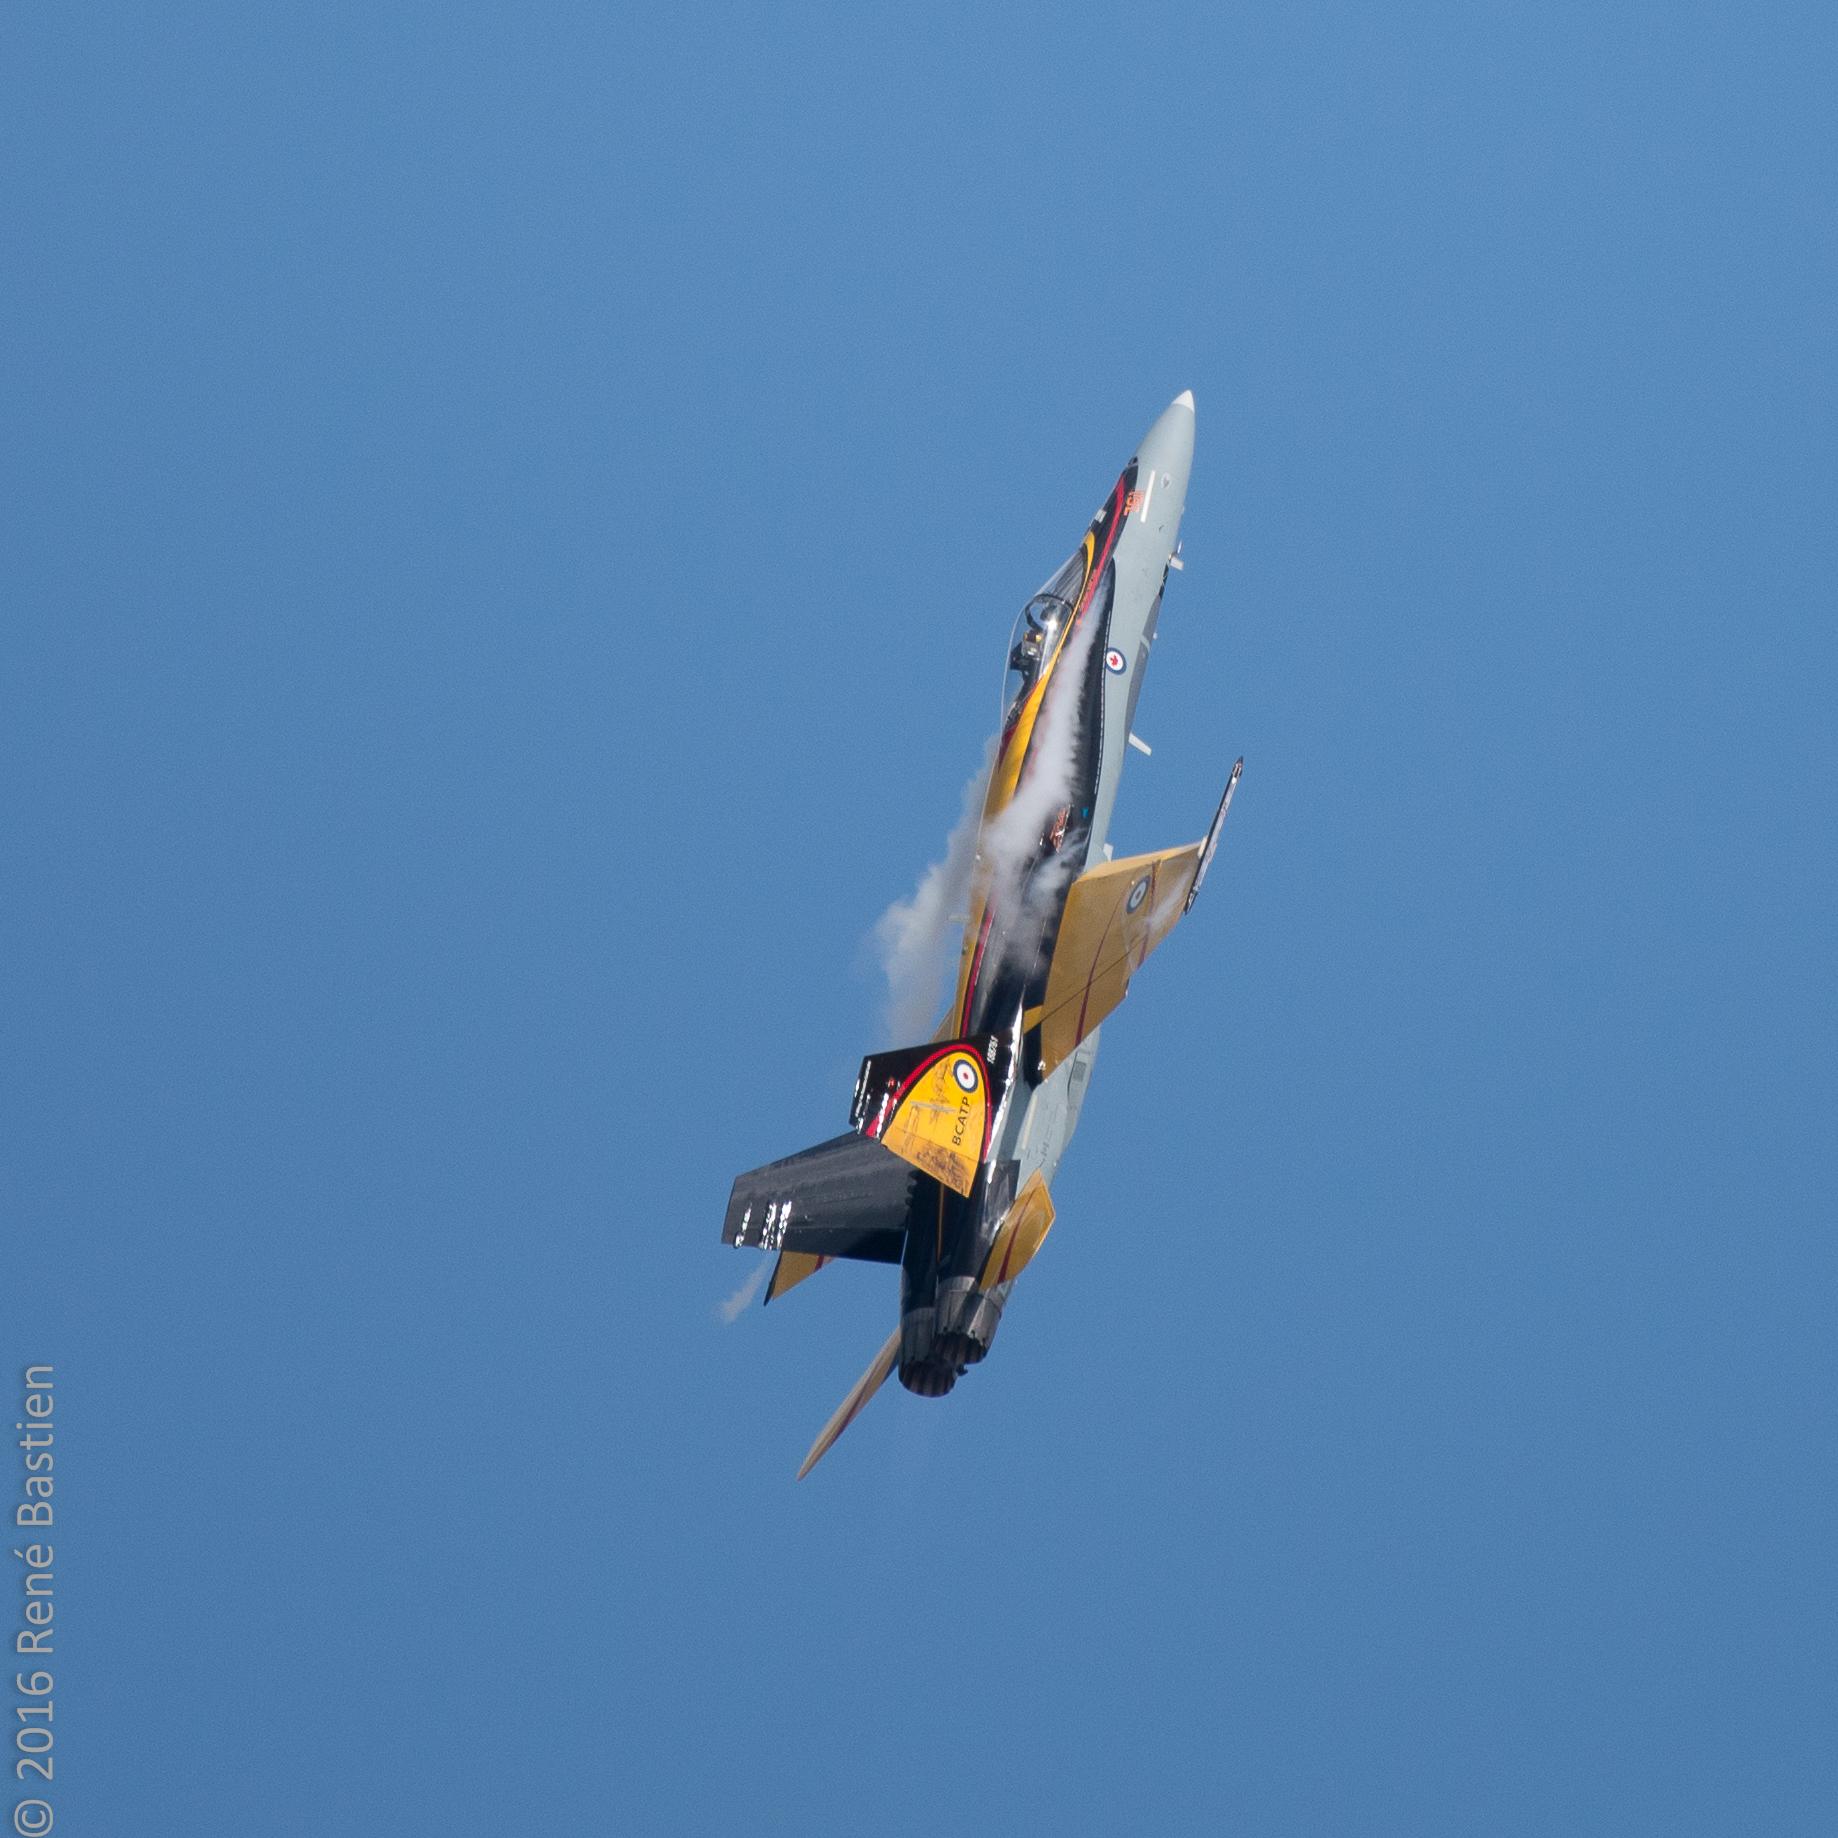 CF18 demo 4106